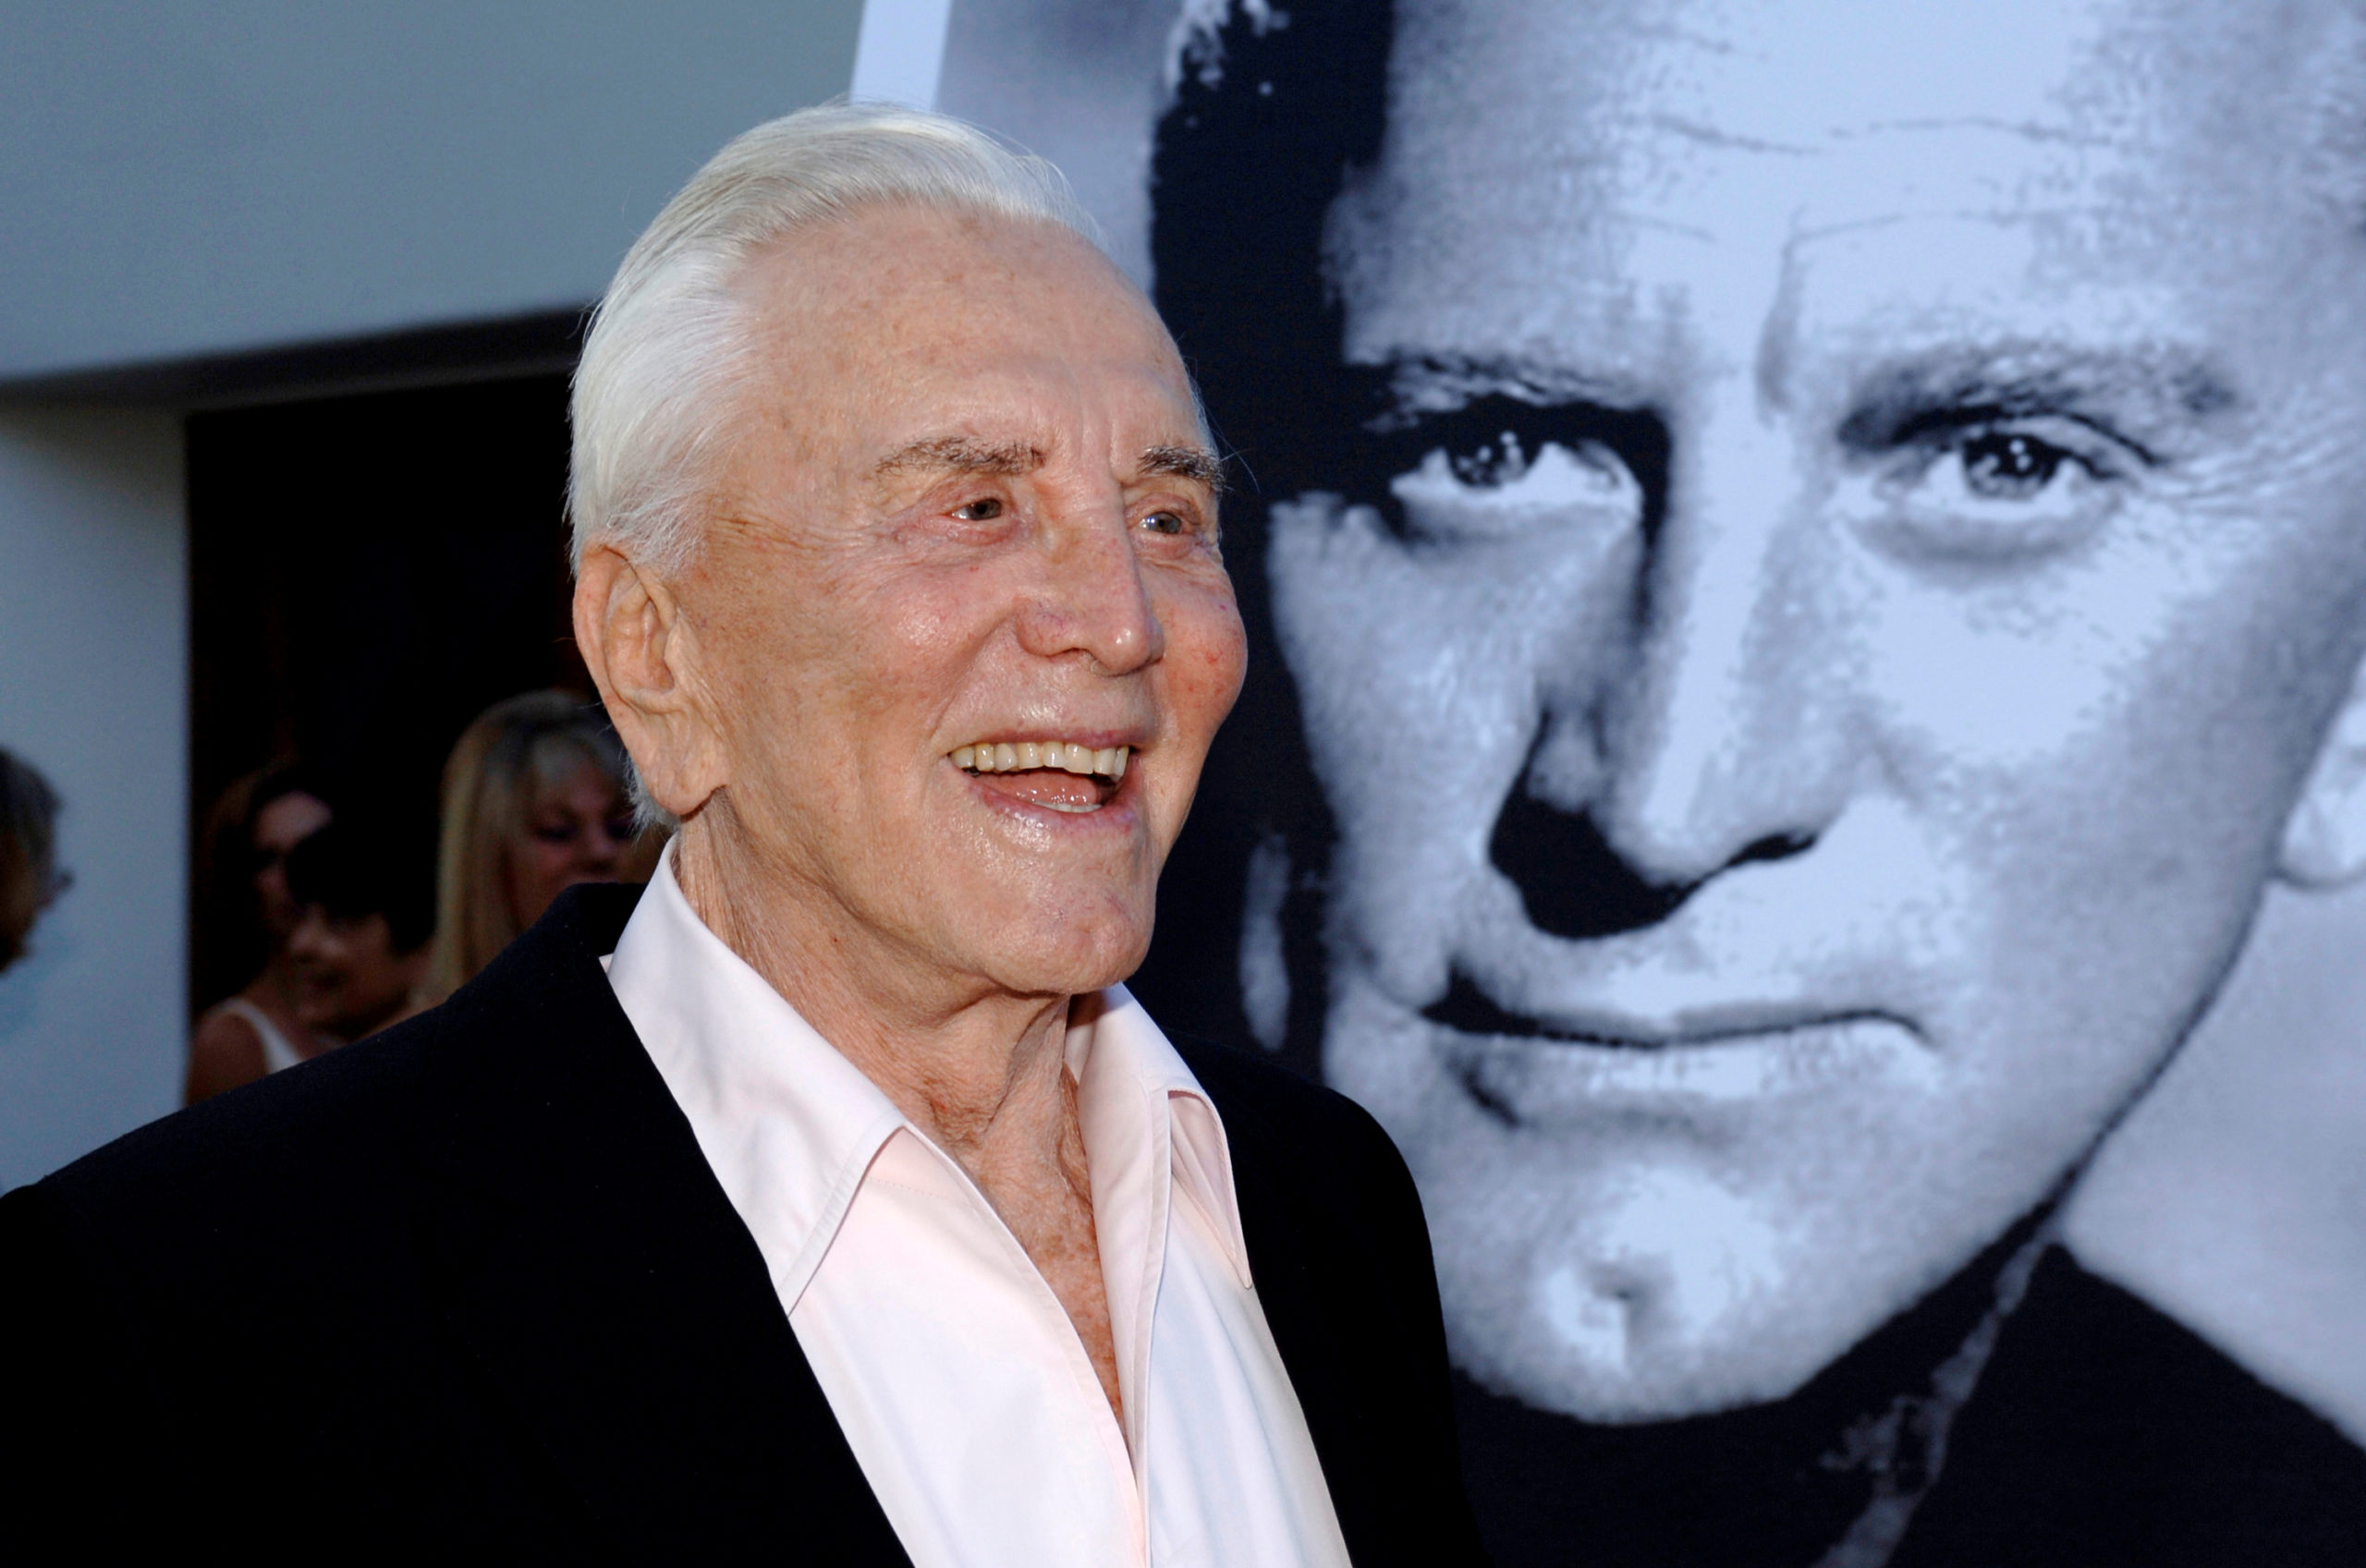 Kirk Douglas: Πέθανε σε ηλικία 103 ετών ο θρύλος του Χόλιγουντ